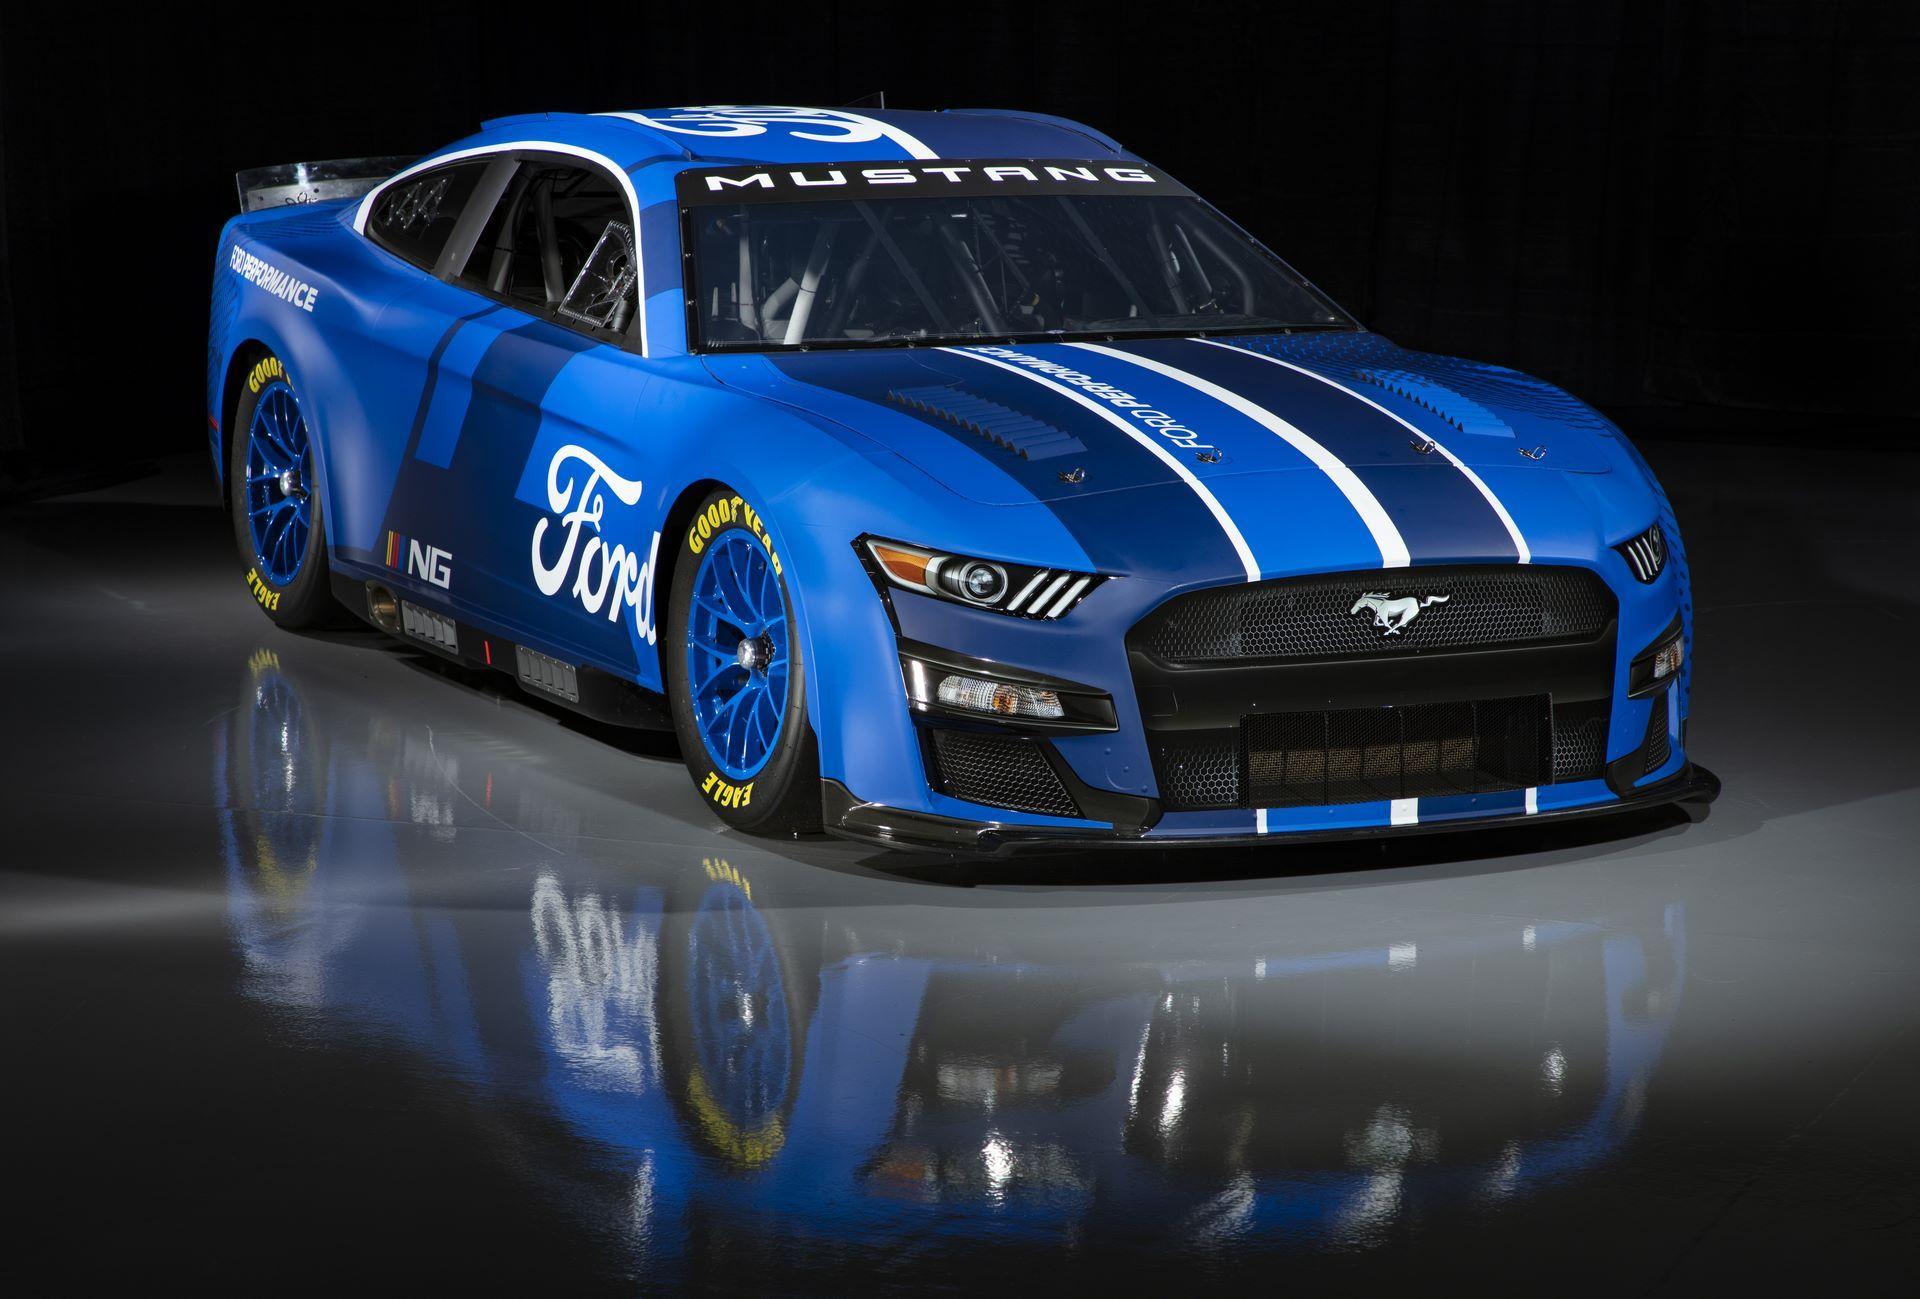 Ford-Mustang-Next-Gen-Nascar-18